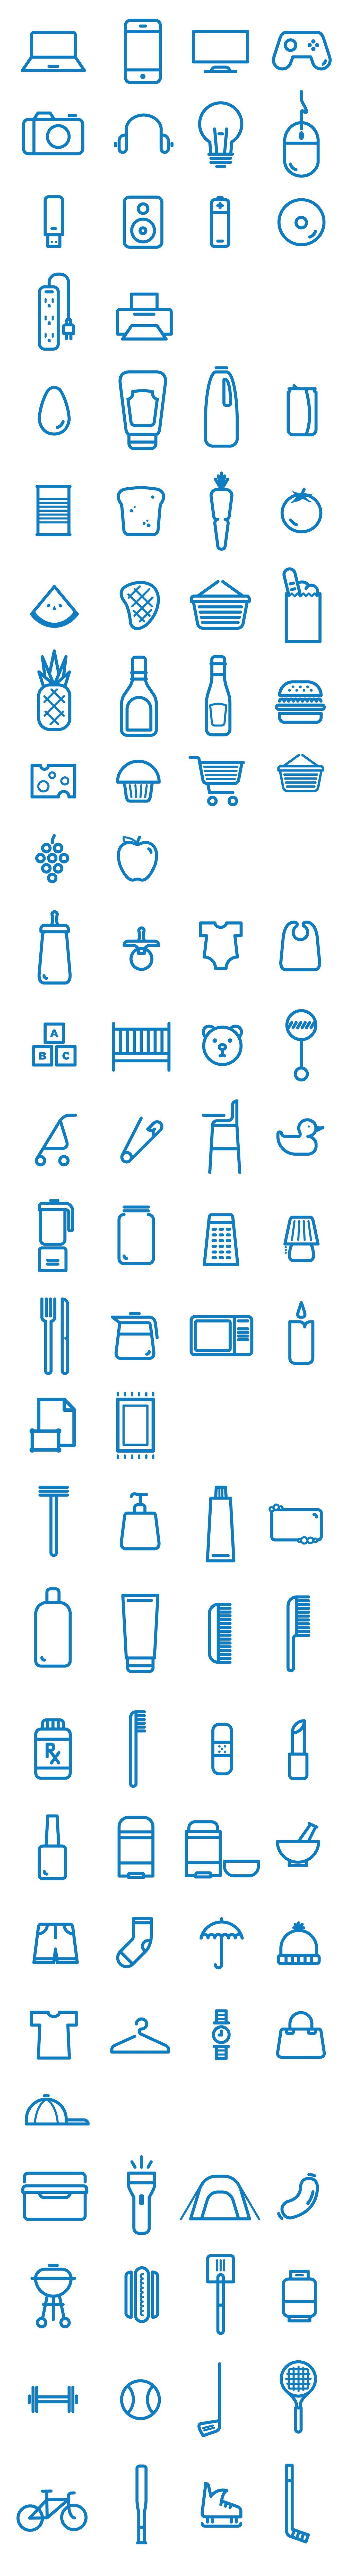 Icons_CompleteSet.jpg